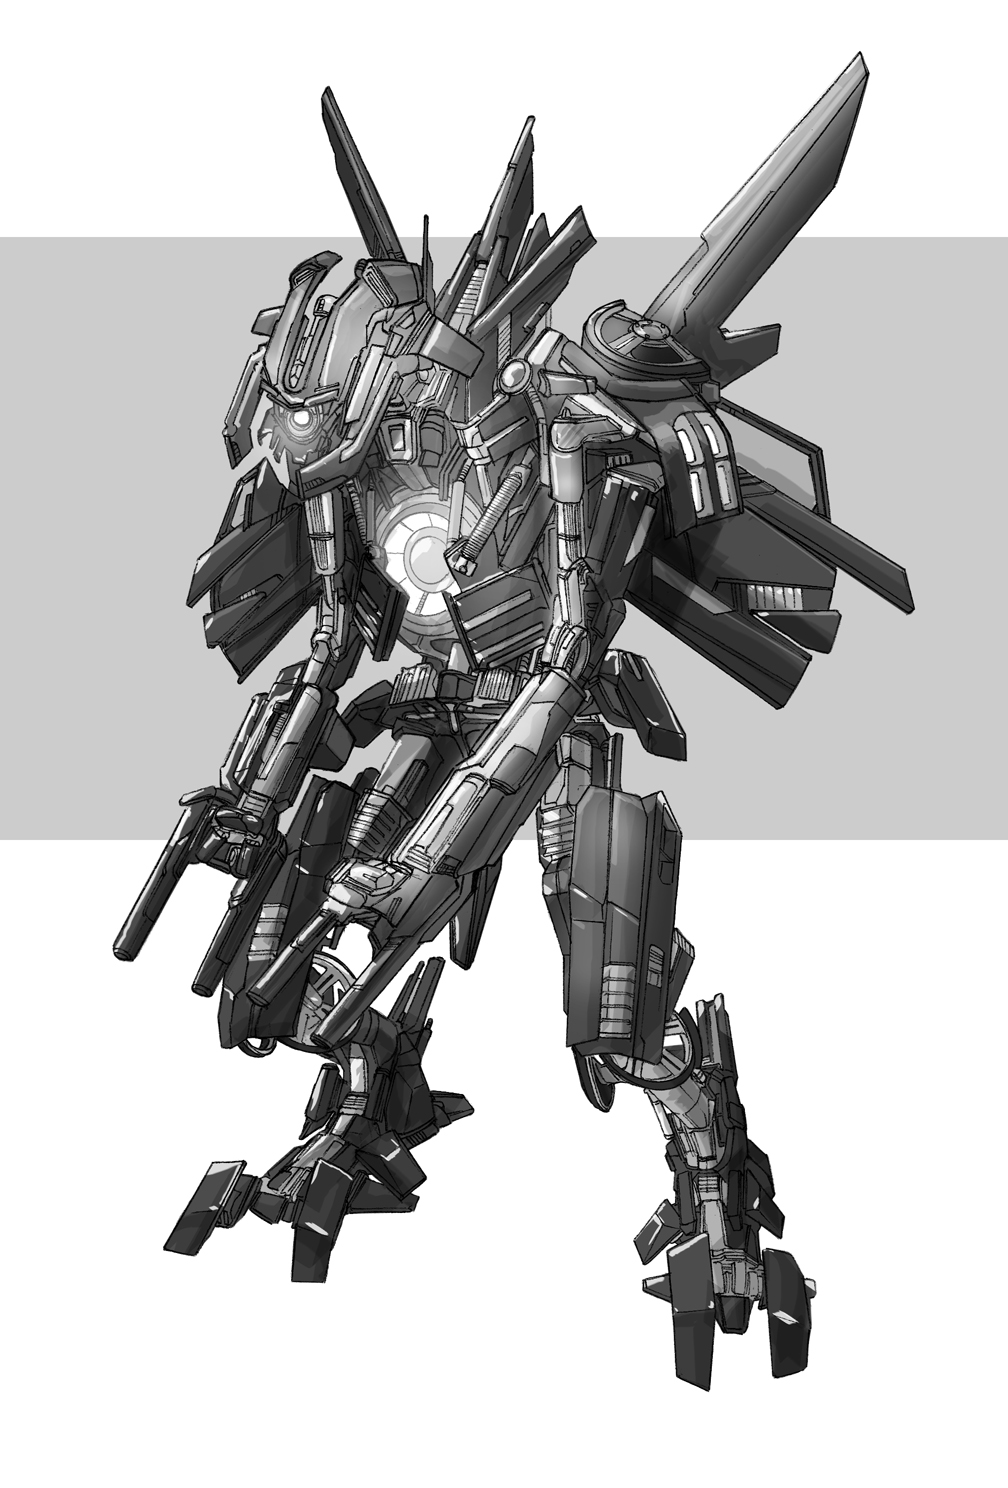 Beast Wars Transmetals Optimus Primal Transformers 2007 Vide...